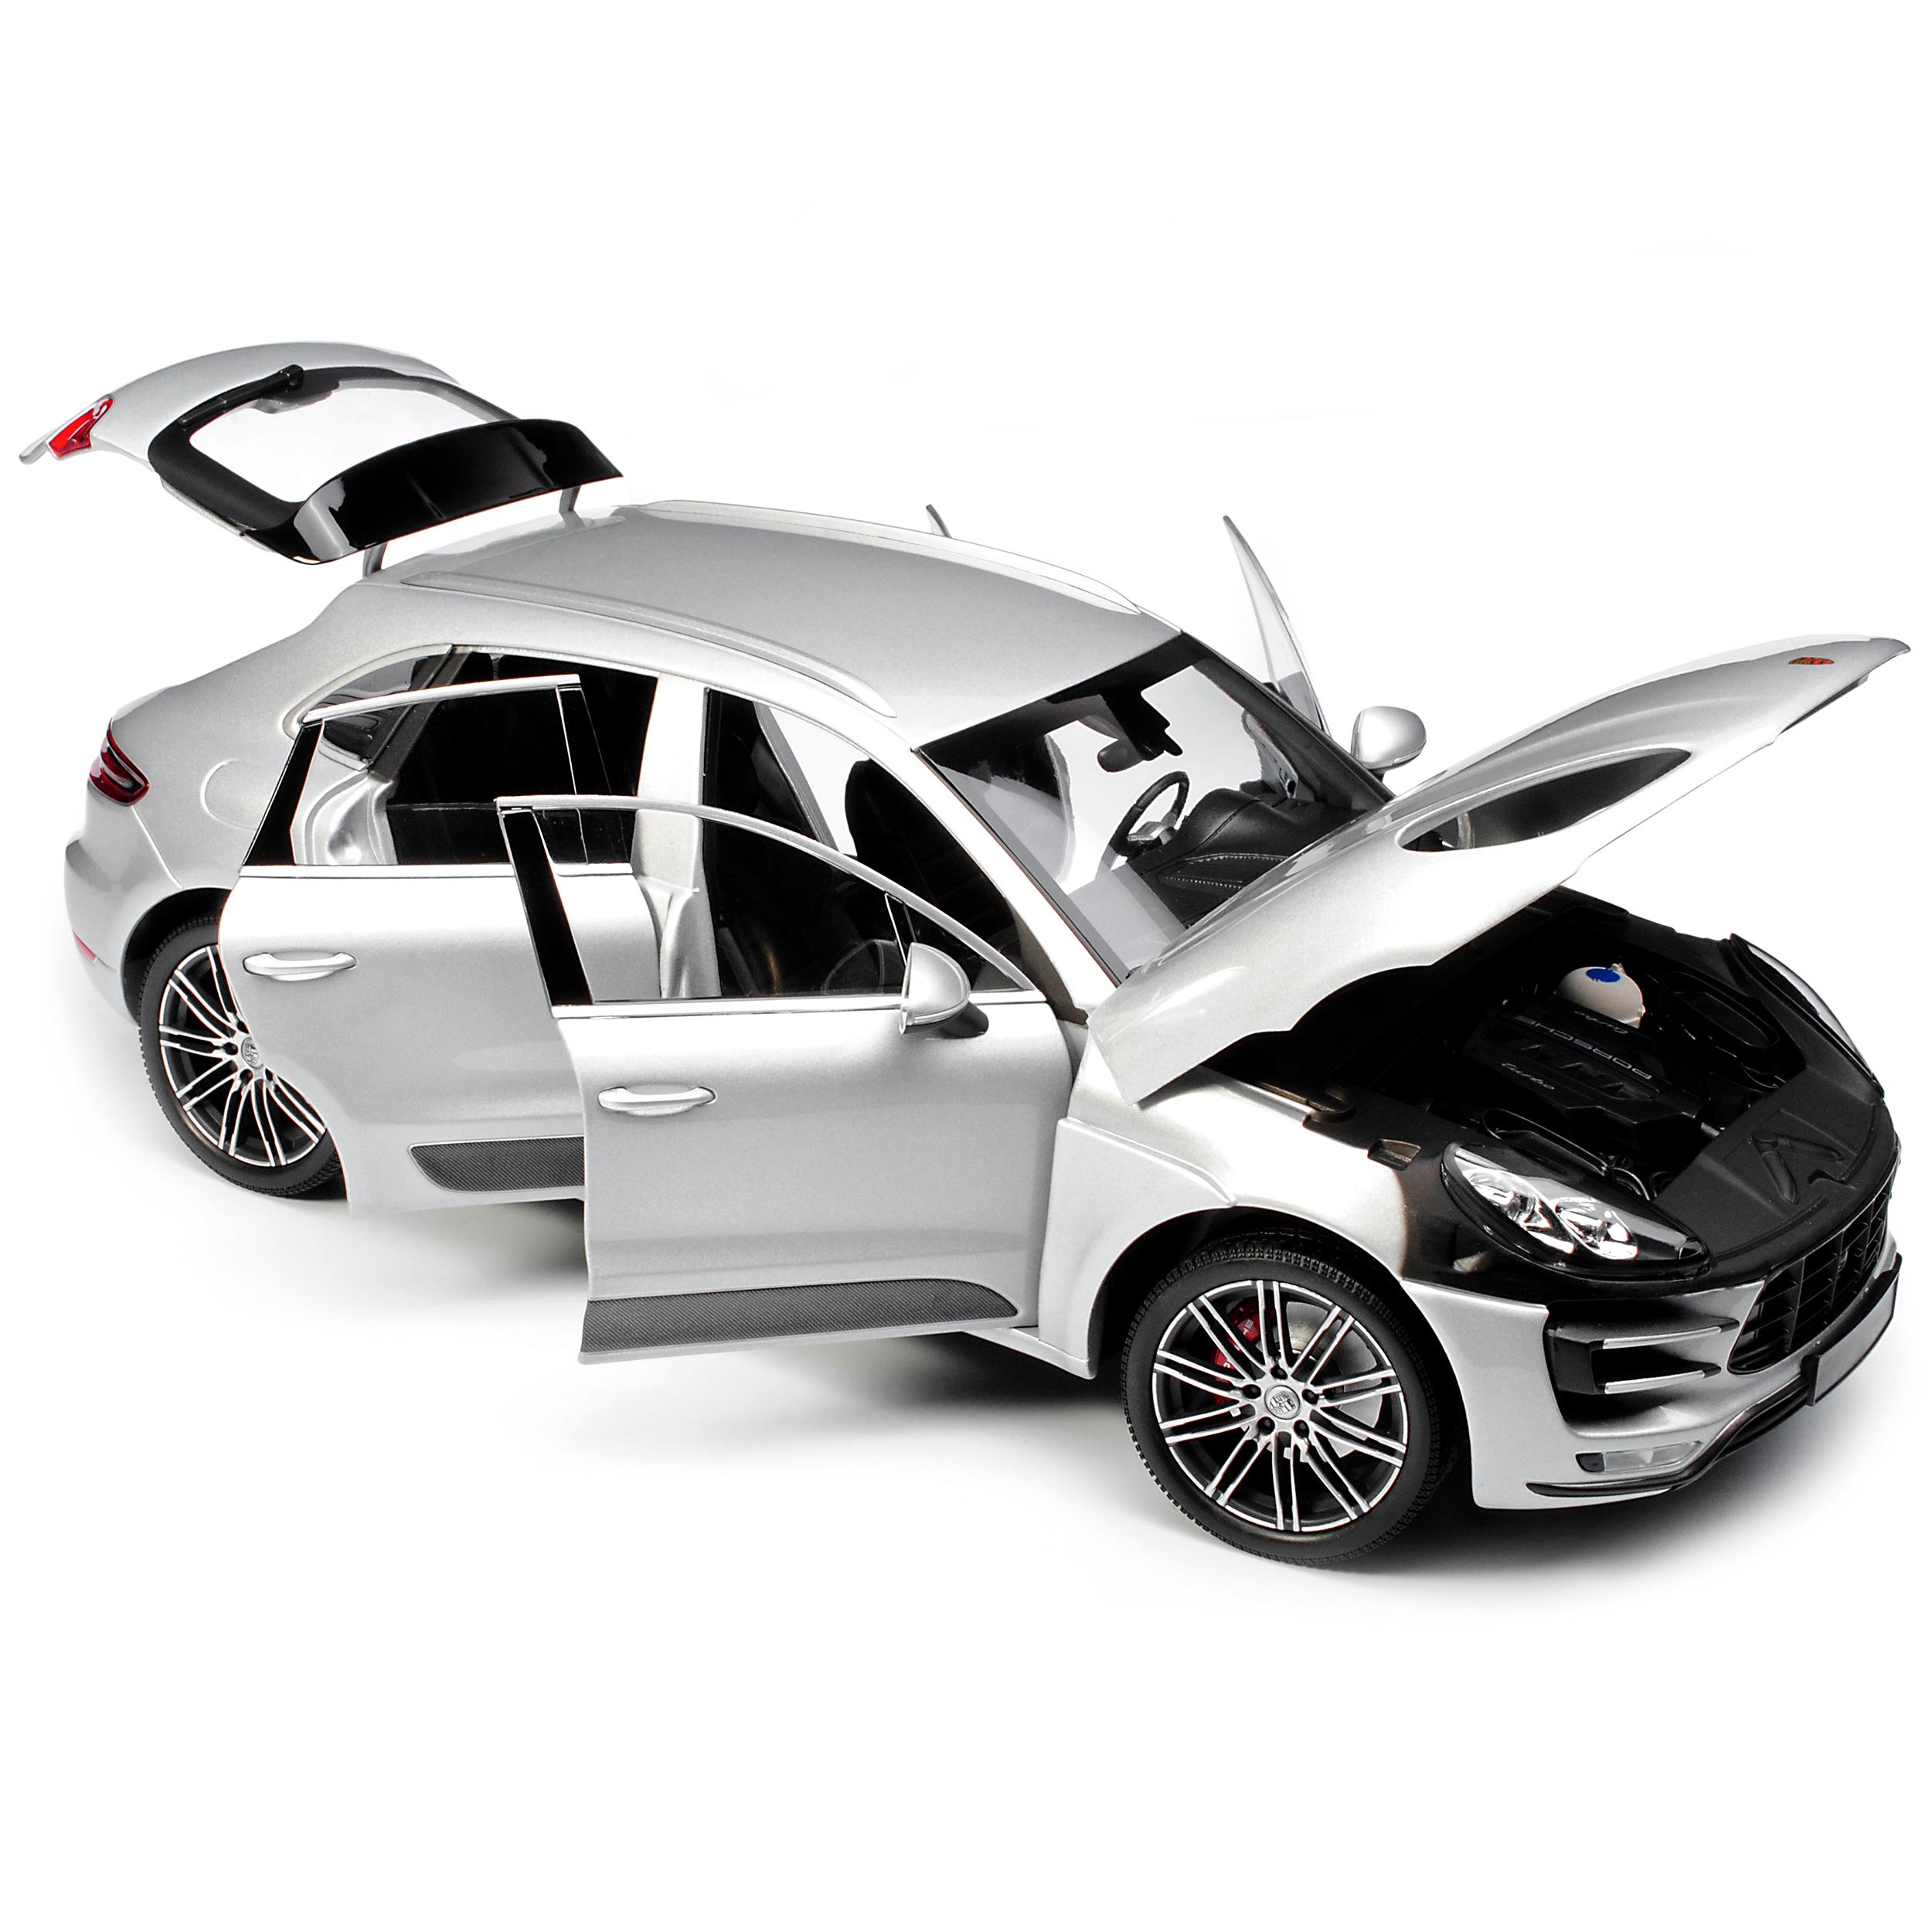 Porsche Macan Turbo Silber Metallic Ab 2014 1//18 Minichamps Modell Auto mit od..